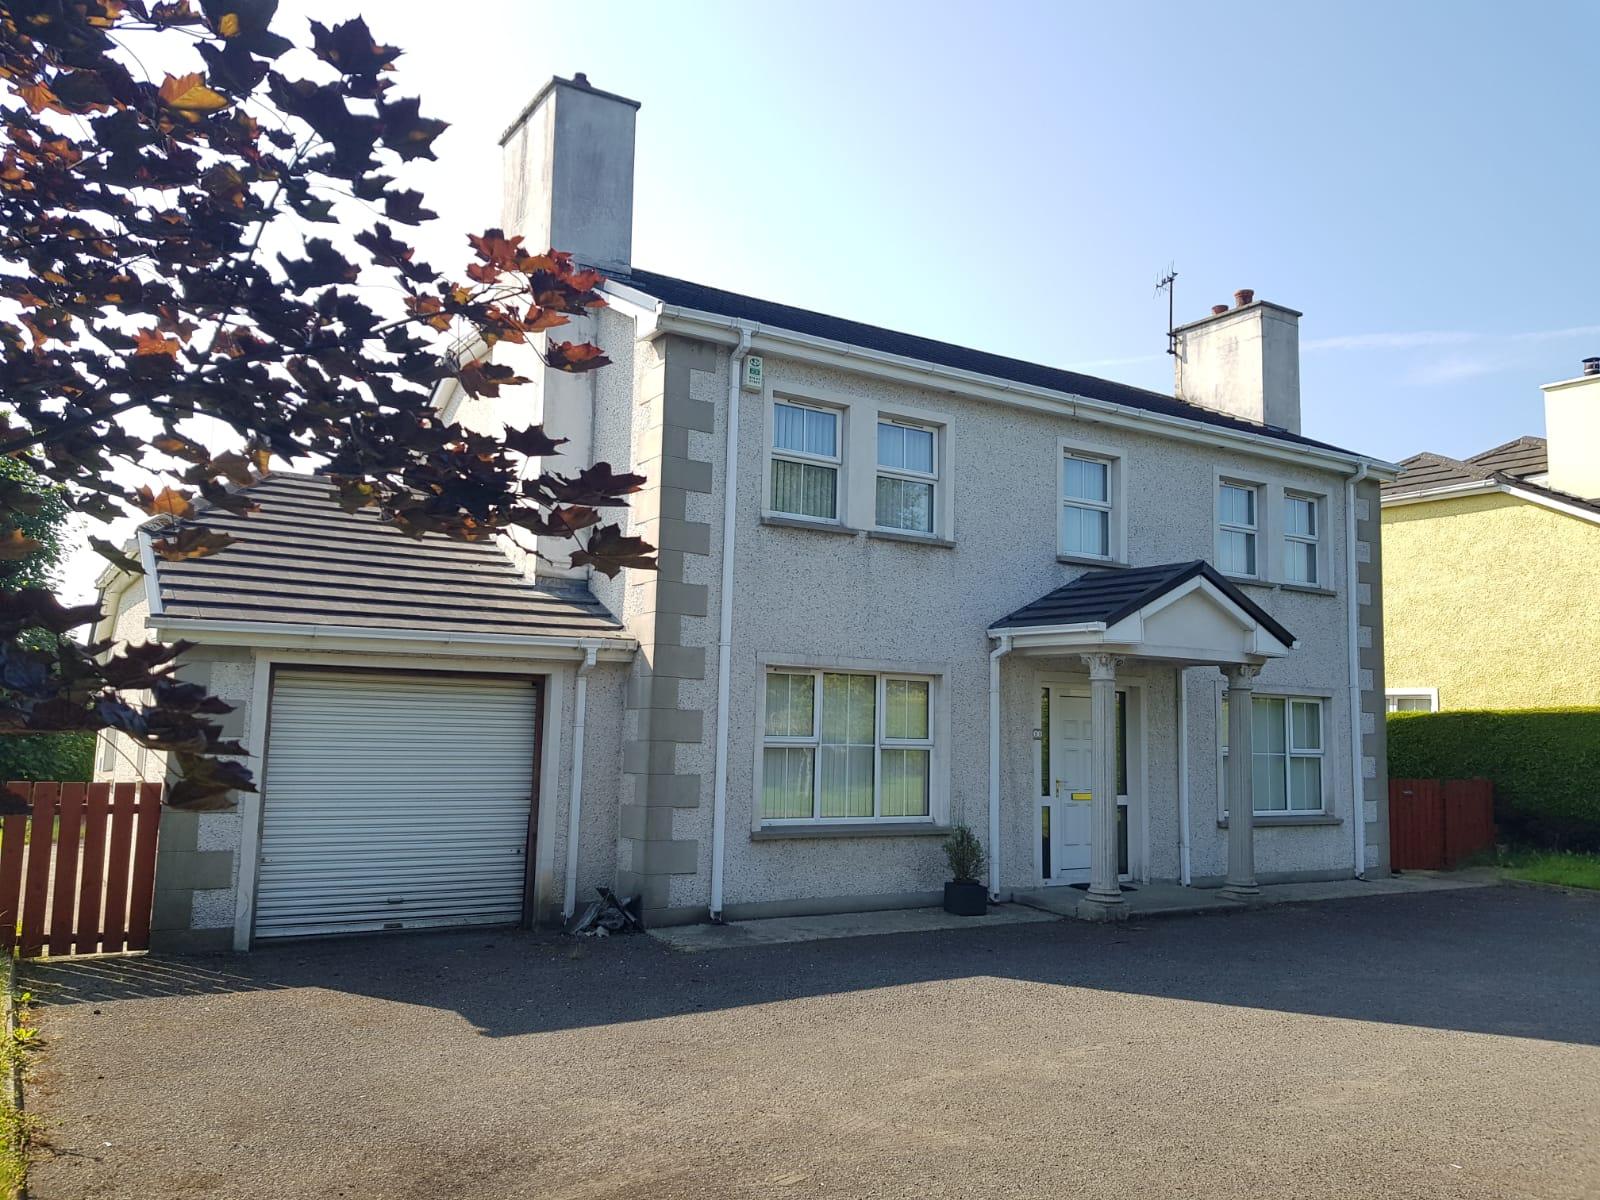 No 11 Blackrock Drive, Ballybofey, Co Donegal F93 F2NF